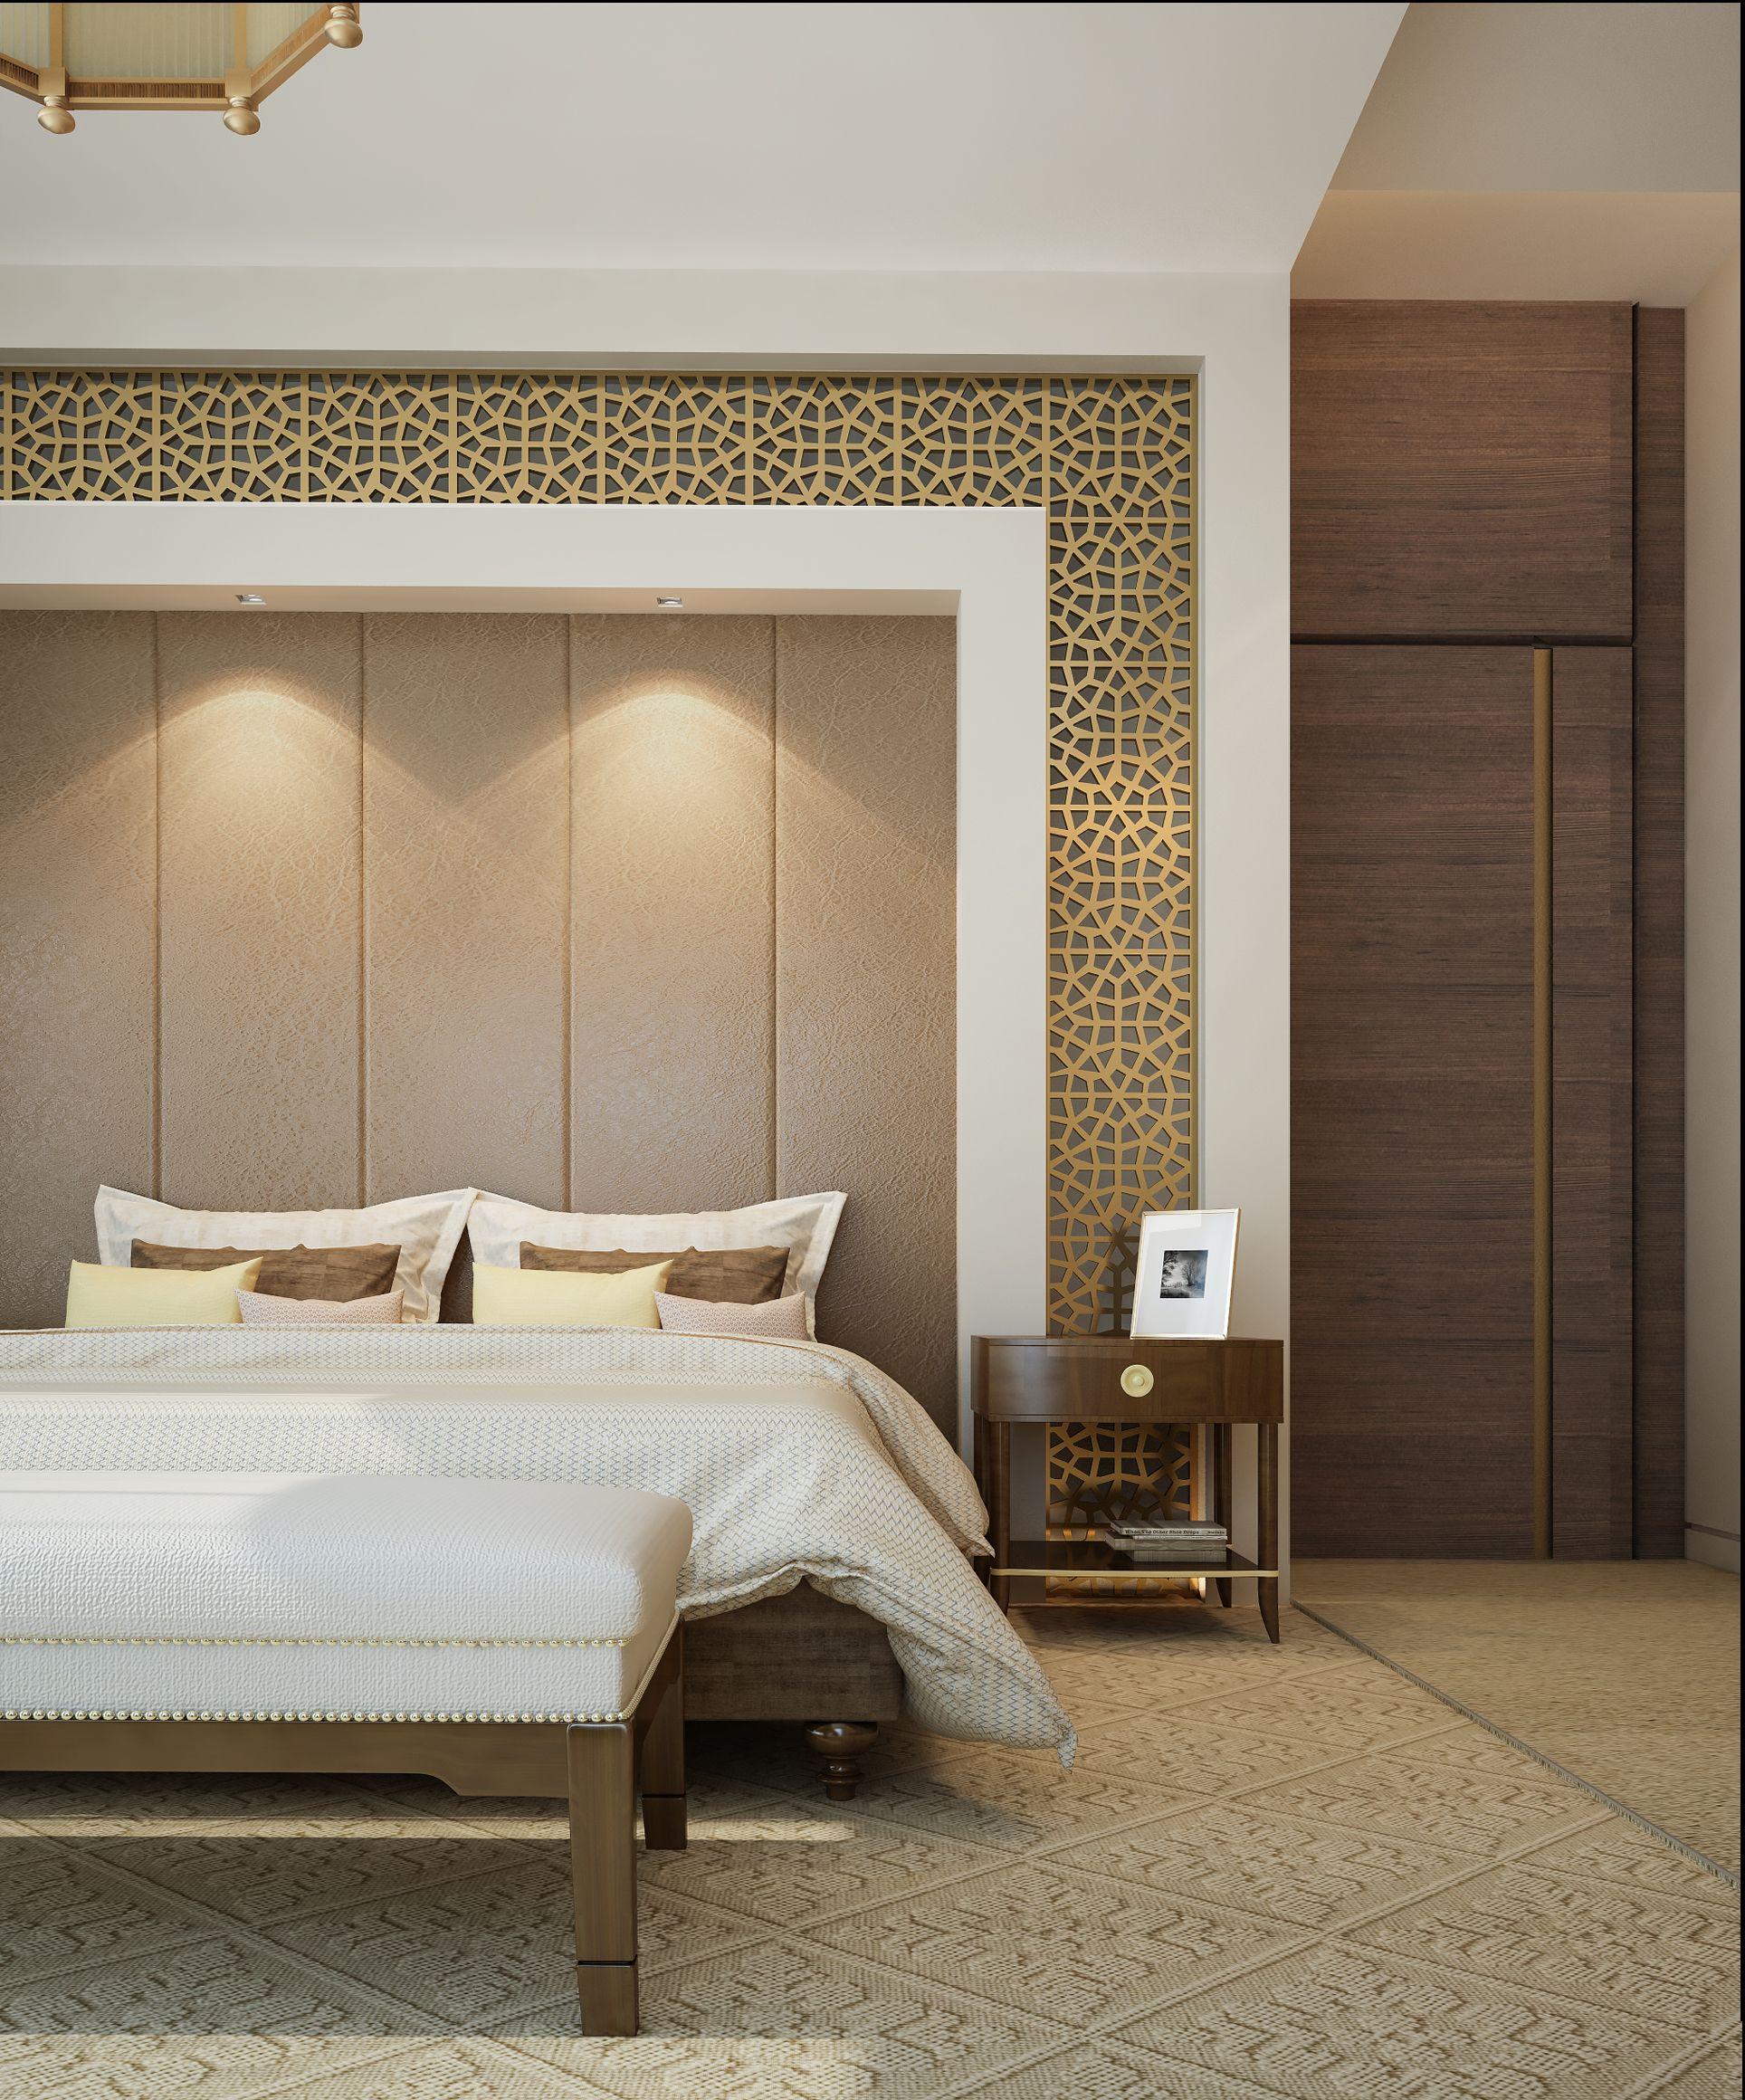 mimar interiors best interior designers best projects on home interior design bedroom id=12744